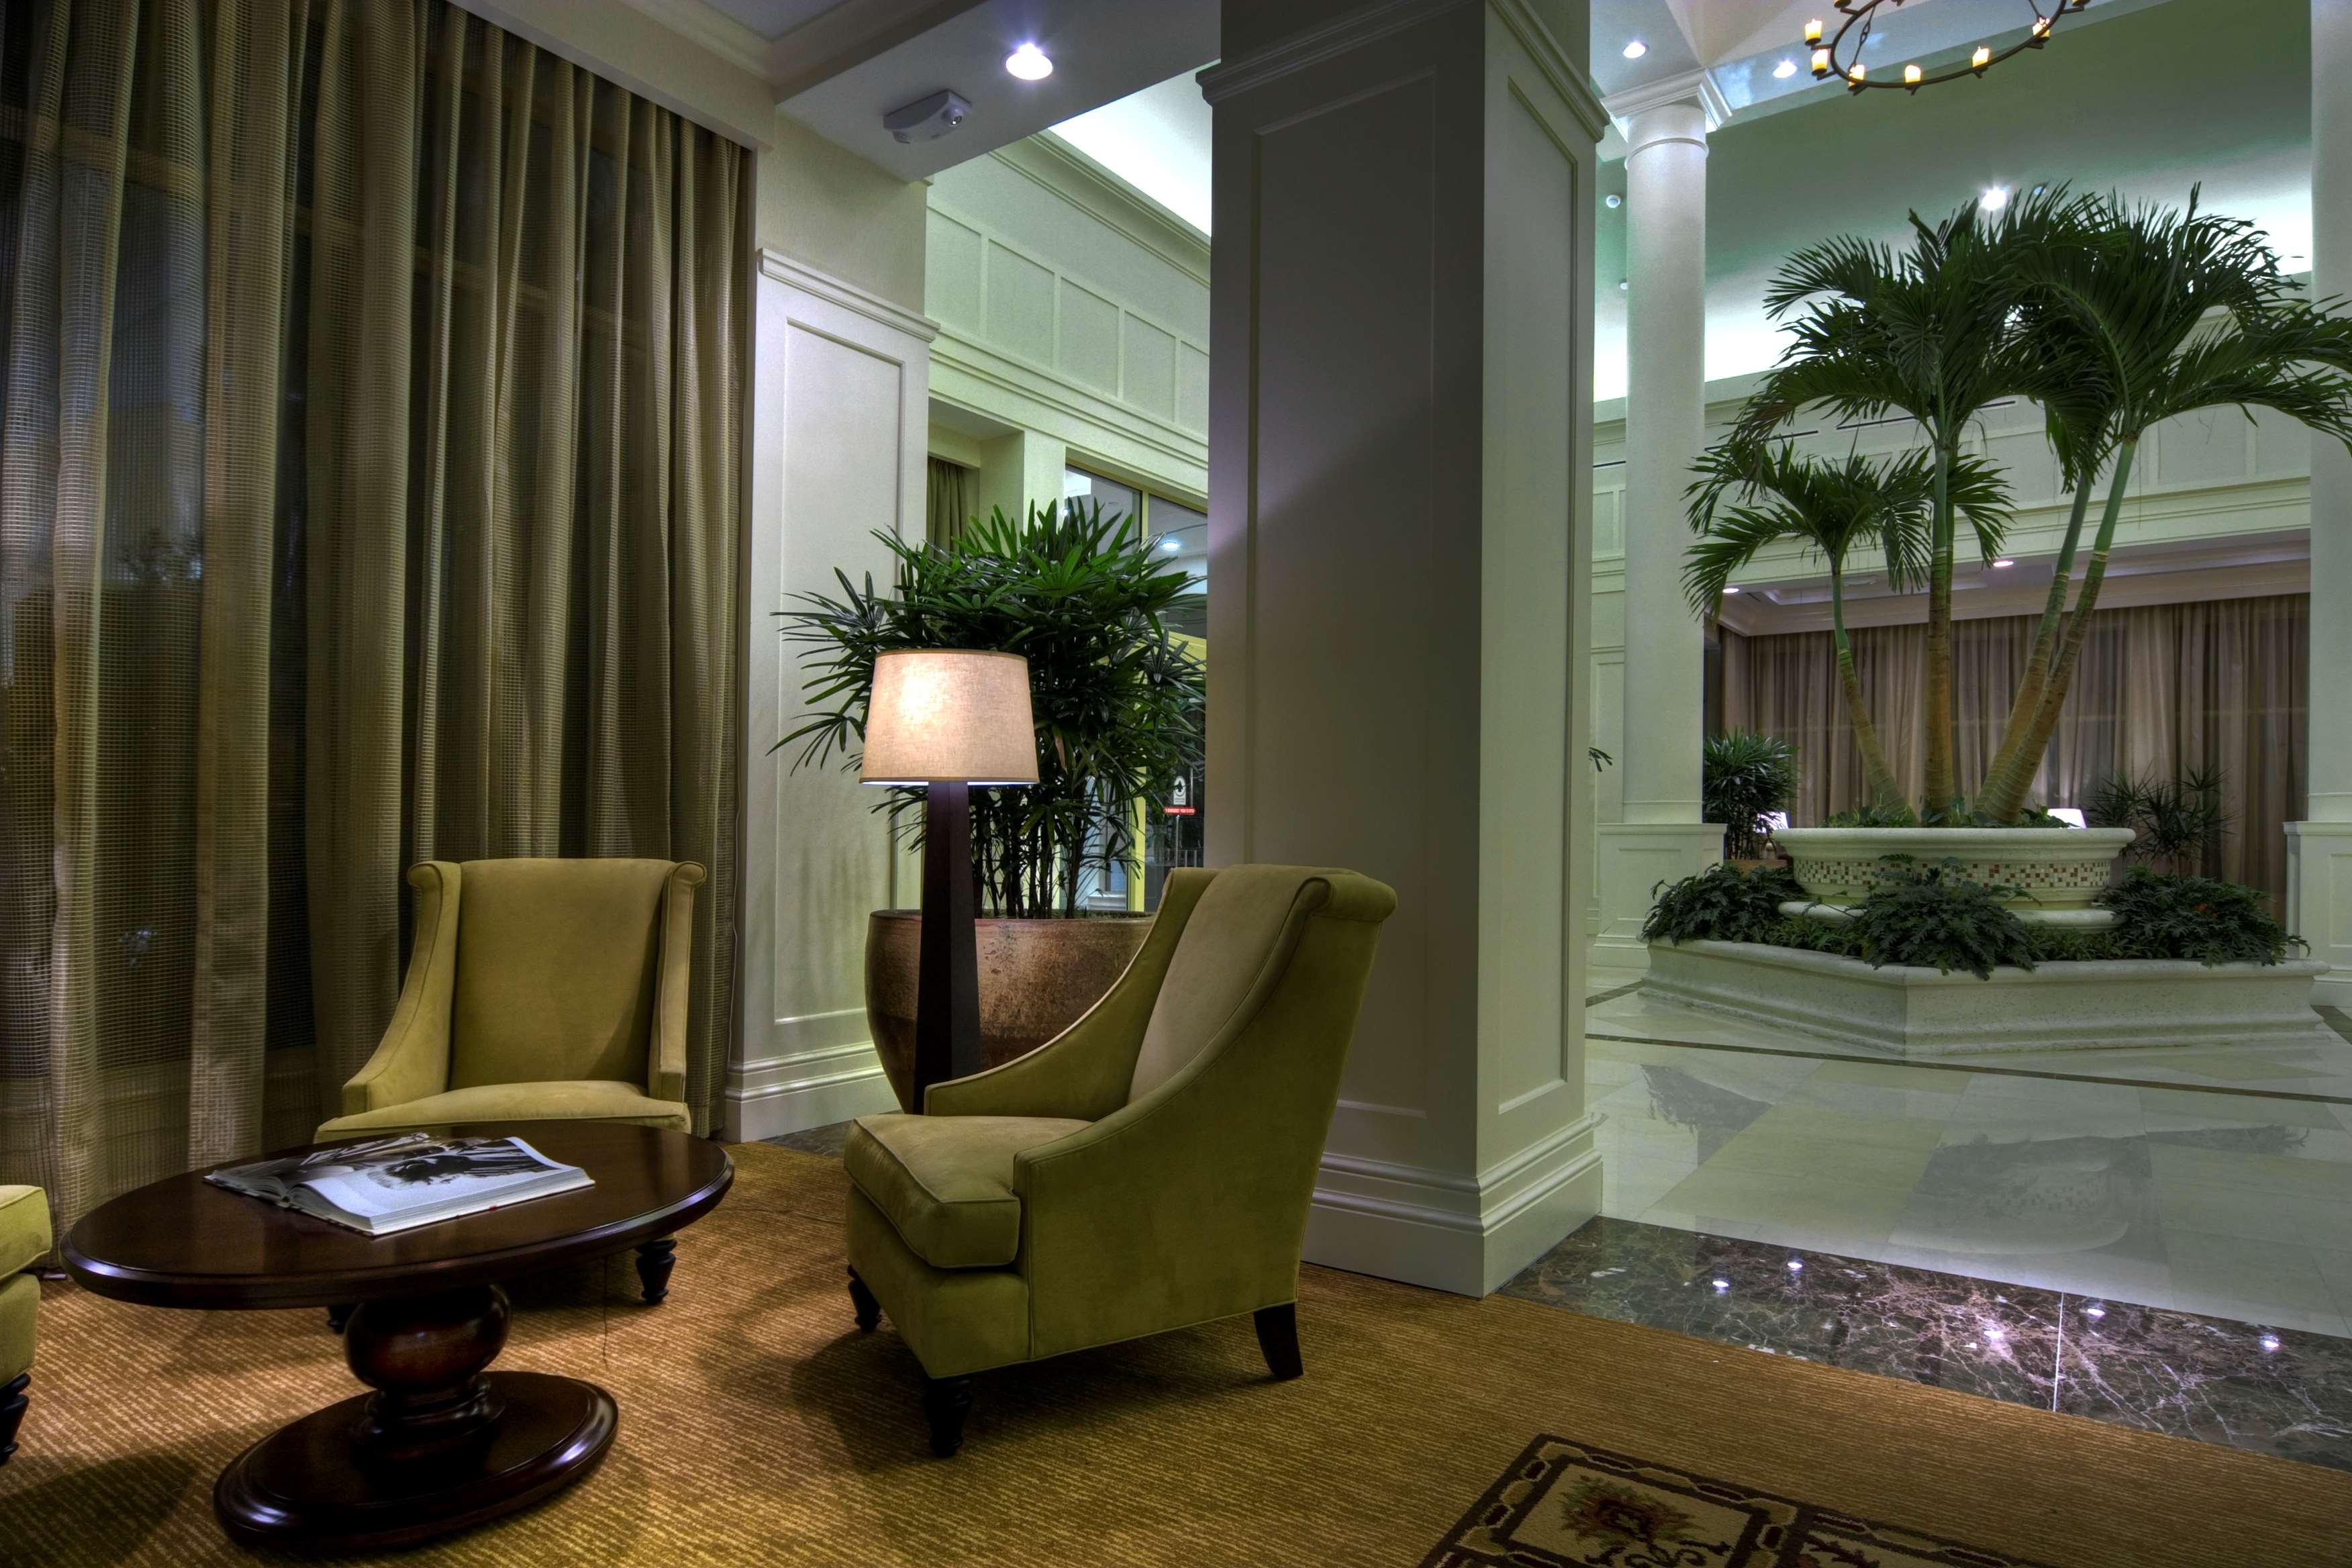 Hilton Garden Inn Palm Beach Gardens image 3